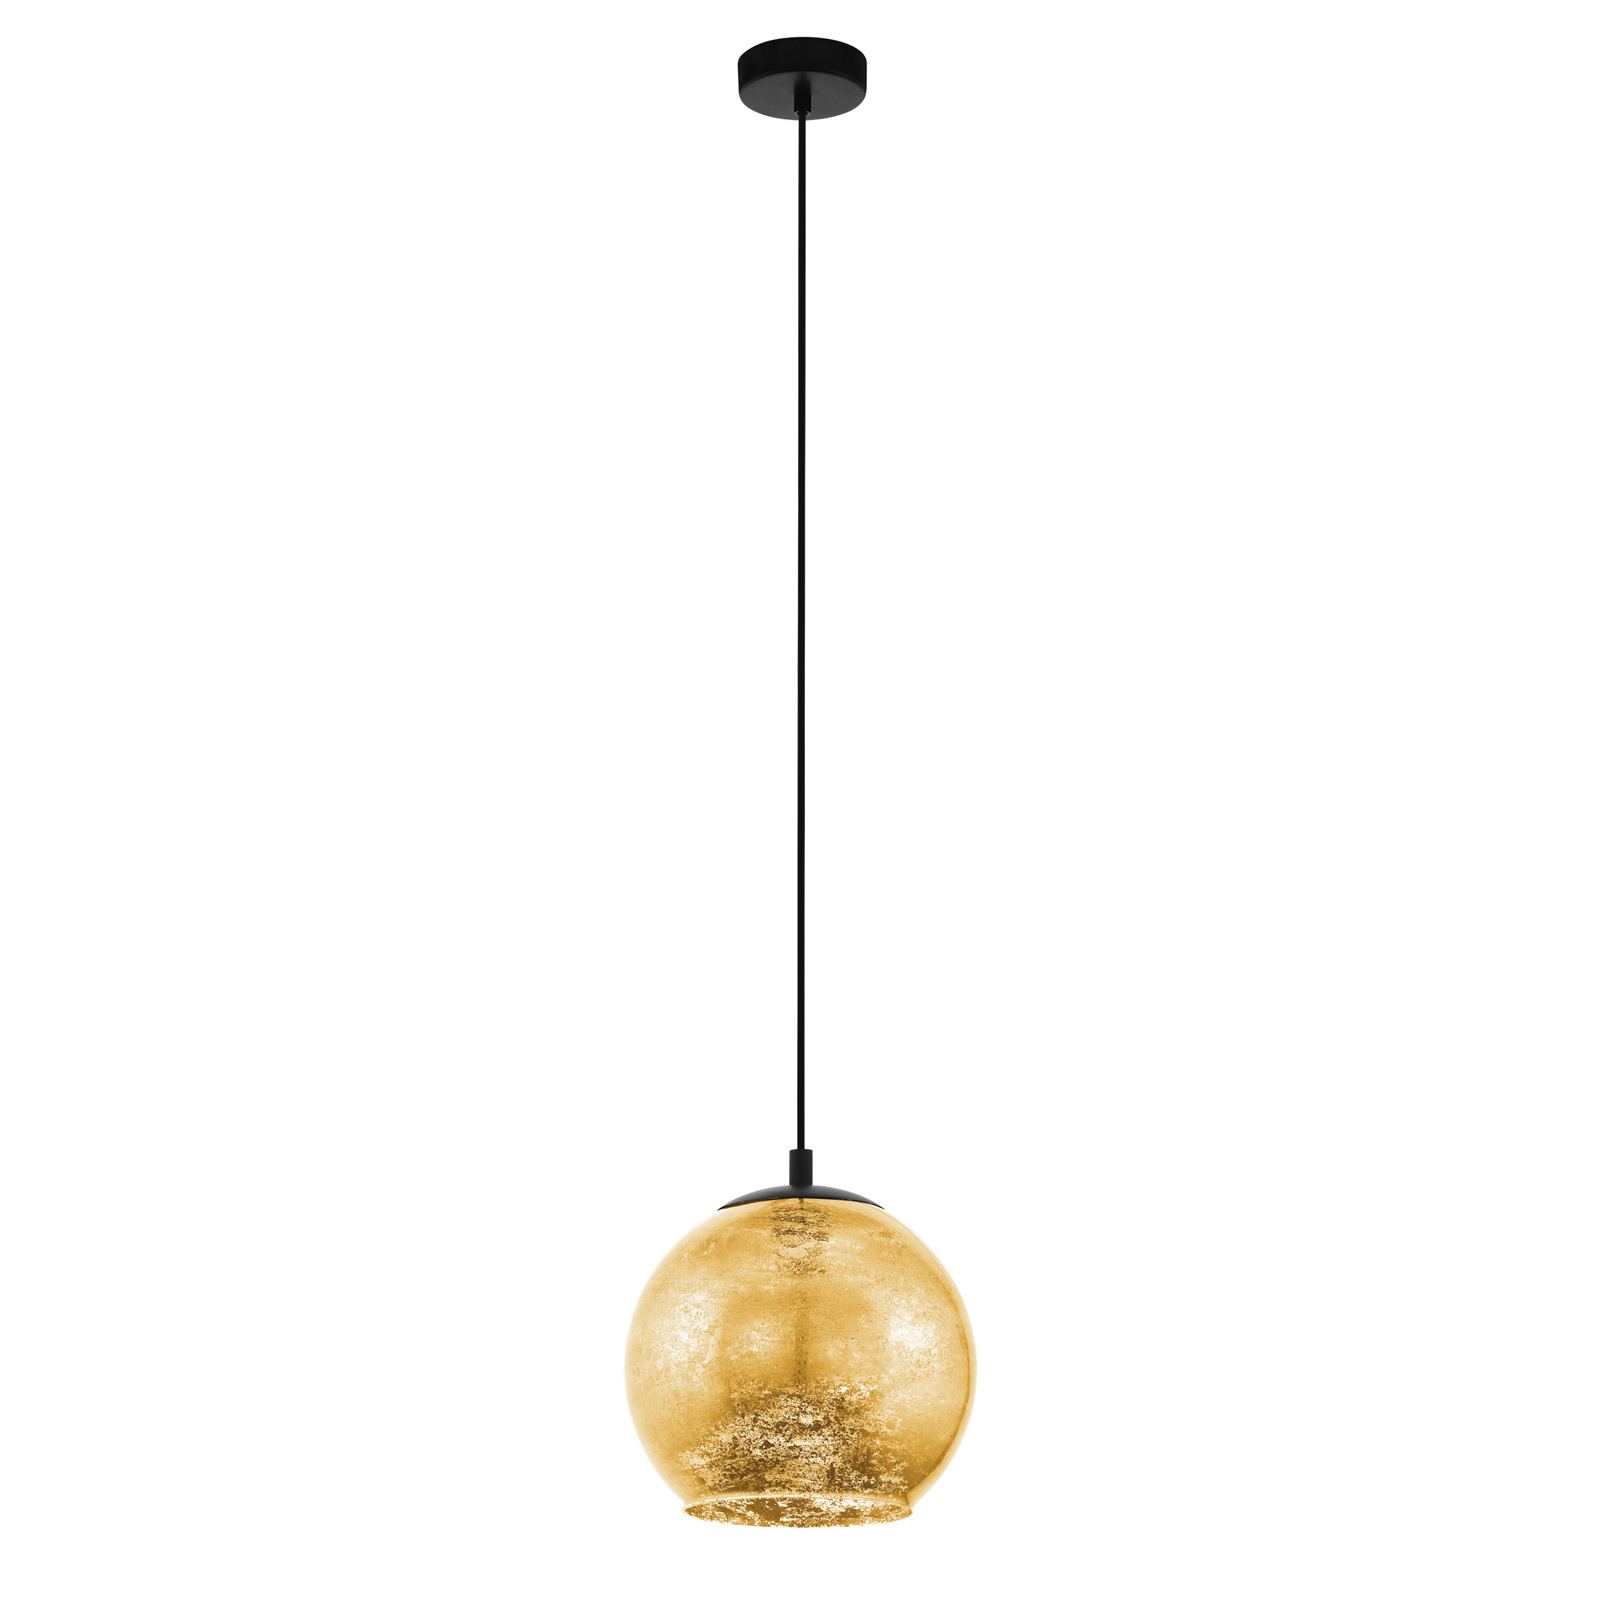 Lampa wisząca Albaraccin 1-punktowa, Ø 27cm